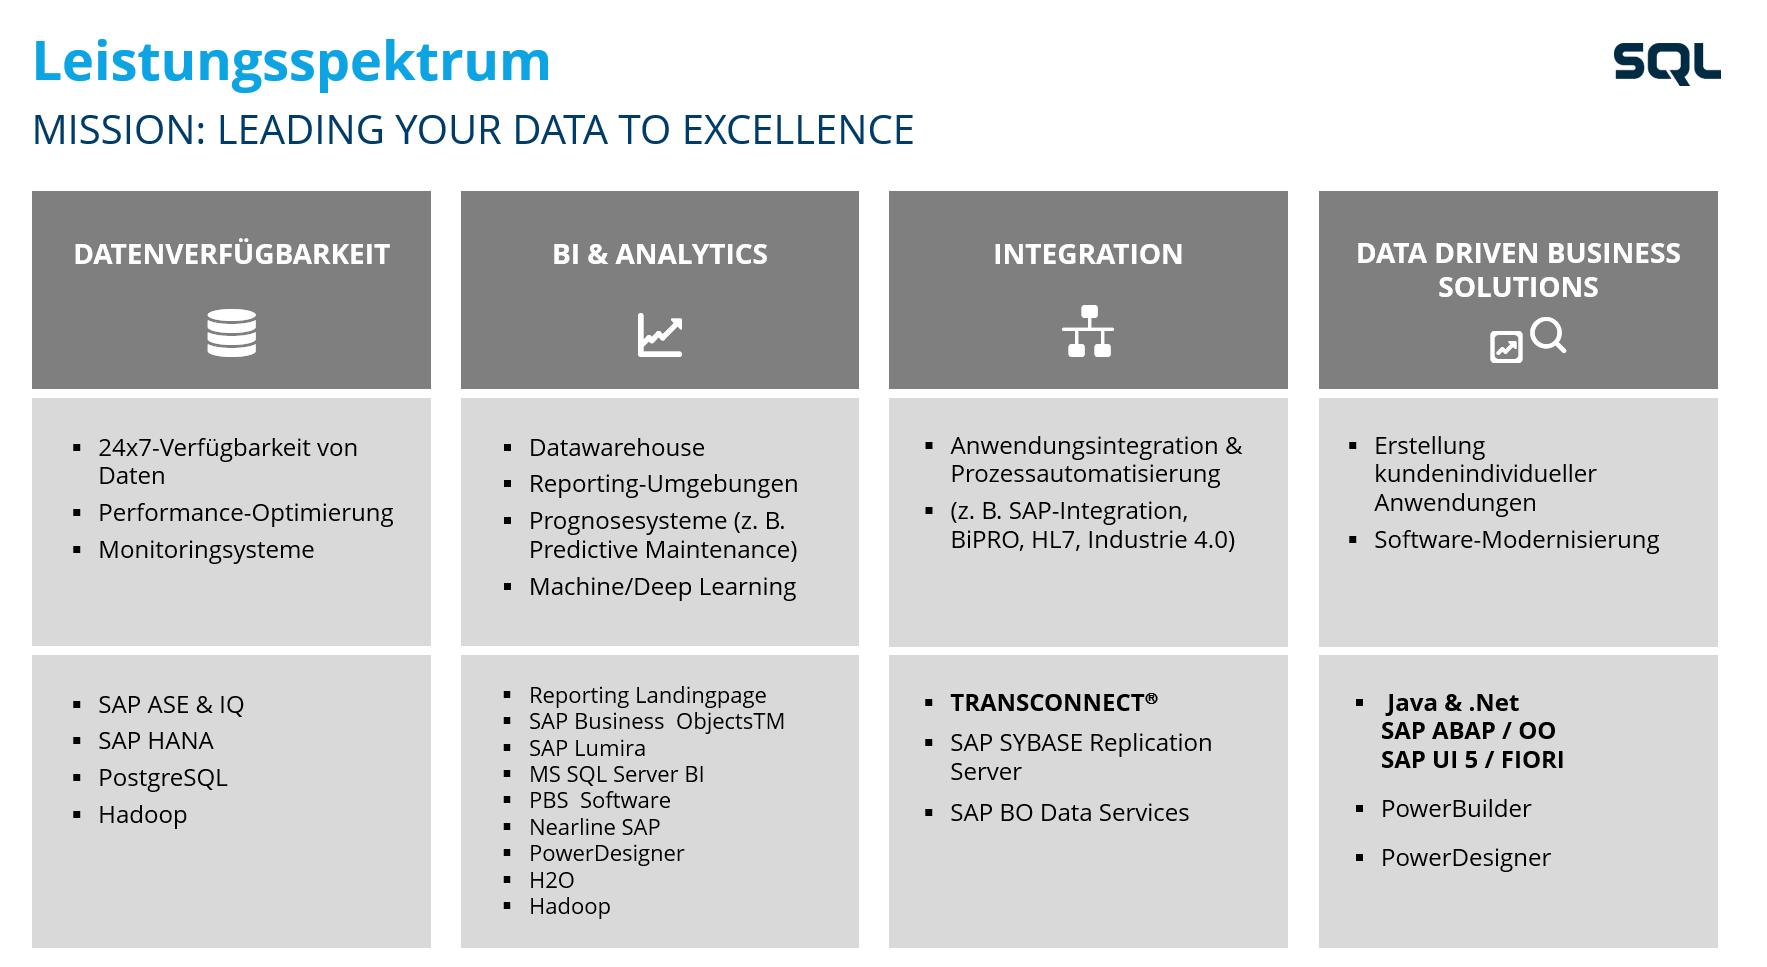 Leistungsspektrum - SQL Projekt AG